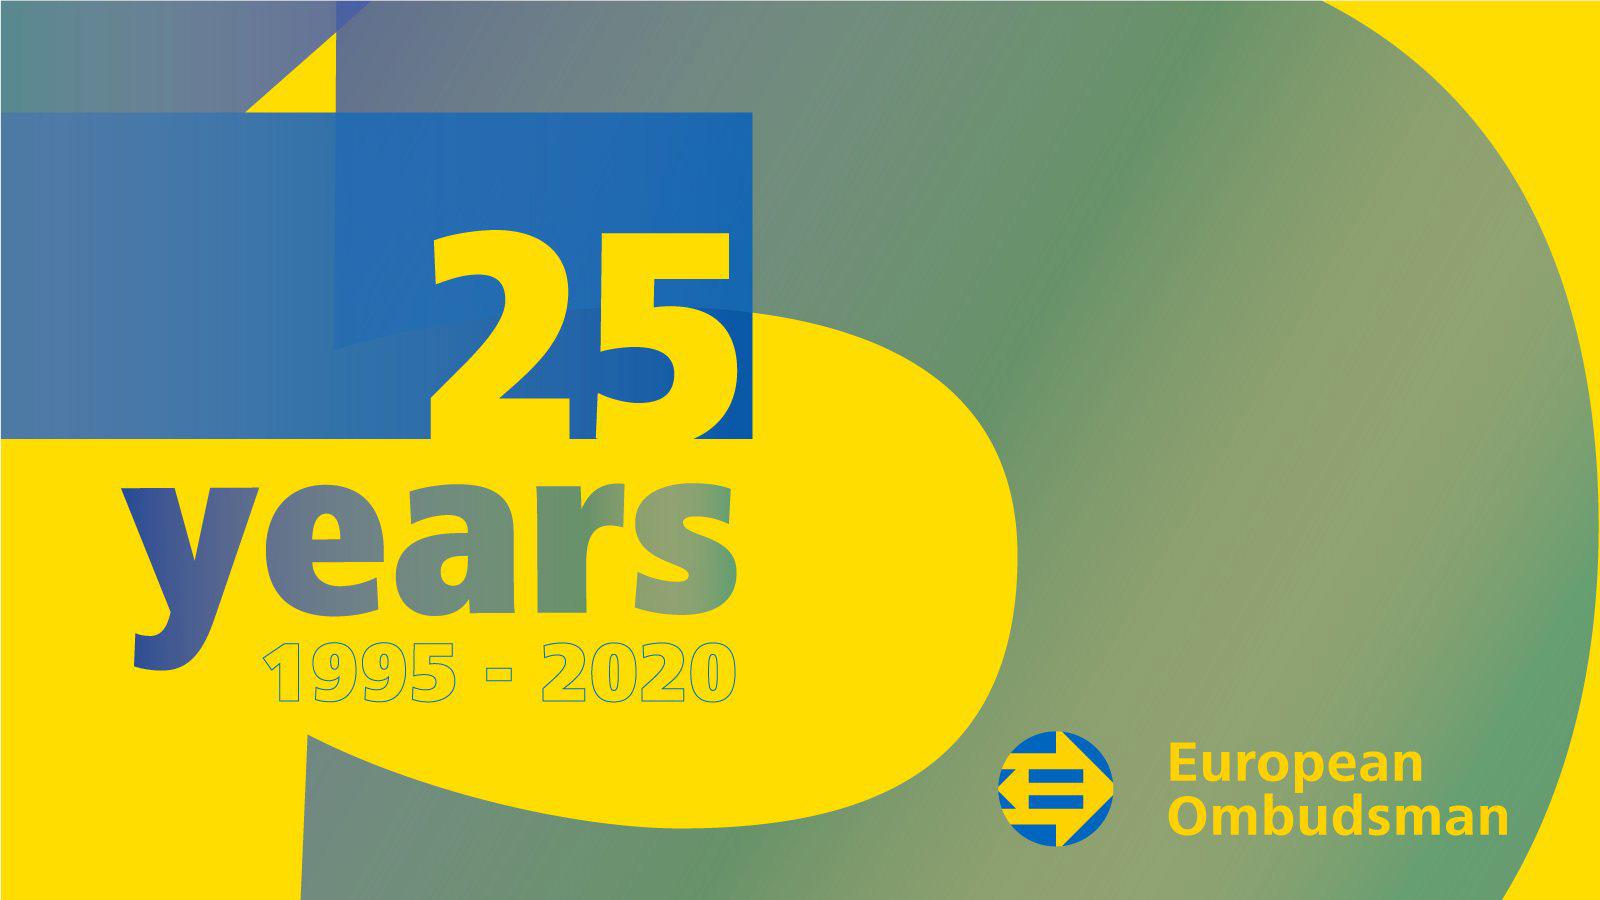 Conferința de aniversare a 25 de ani